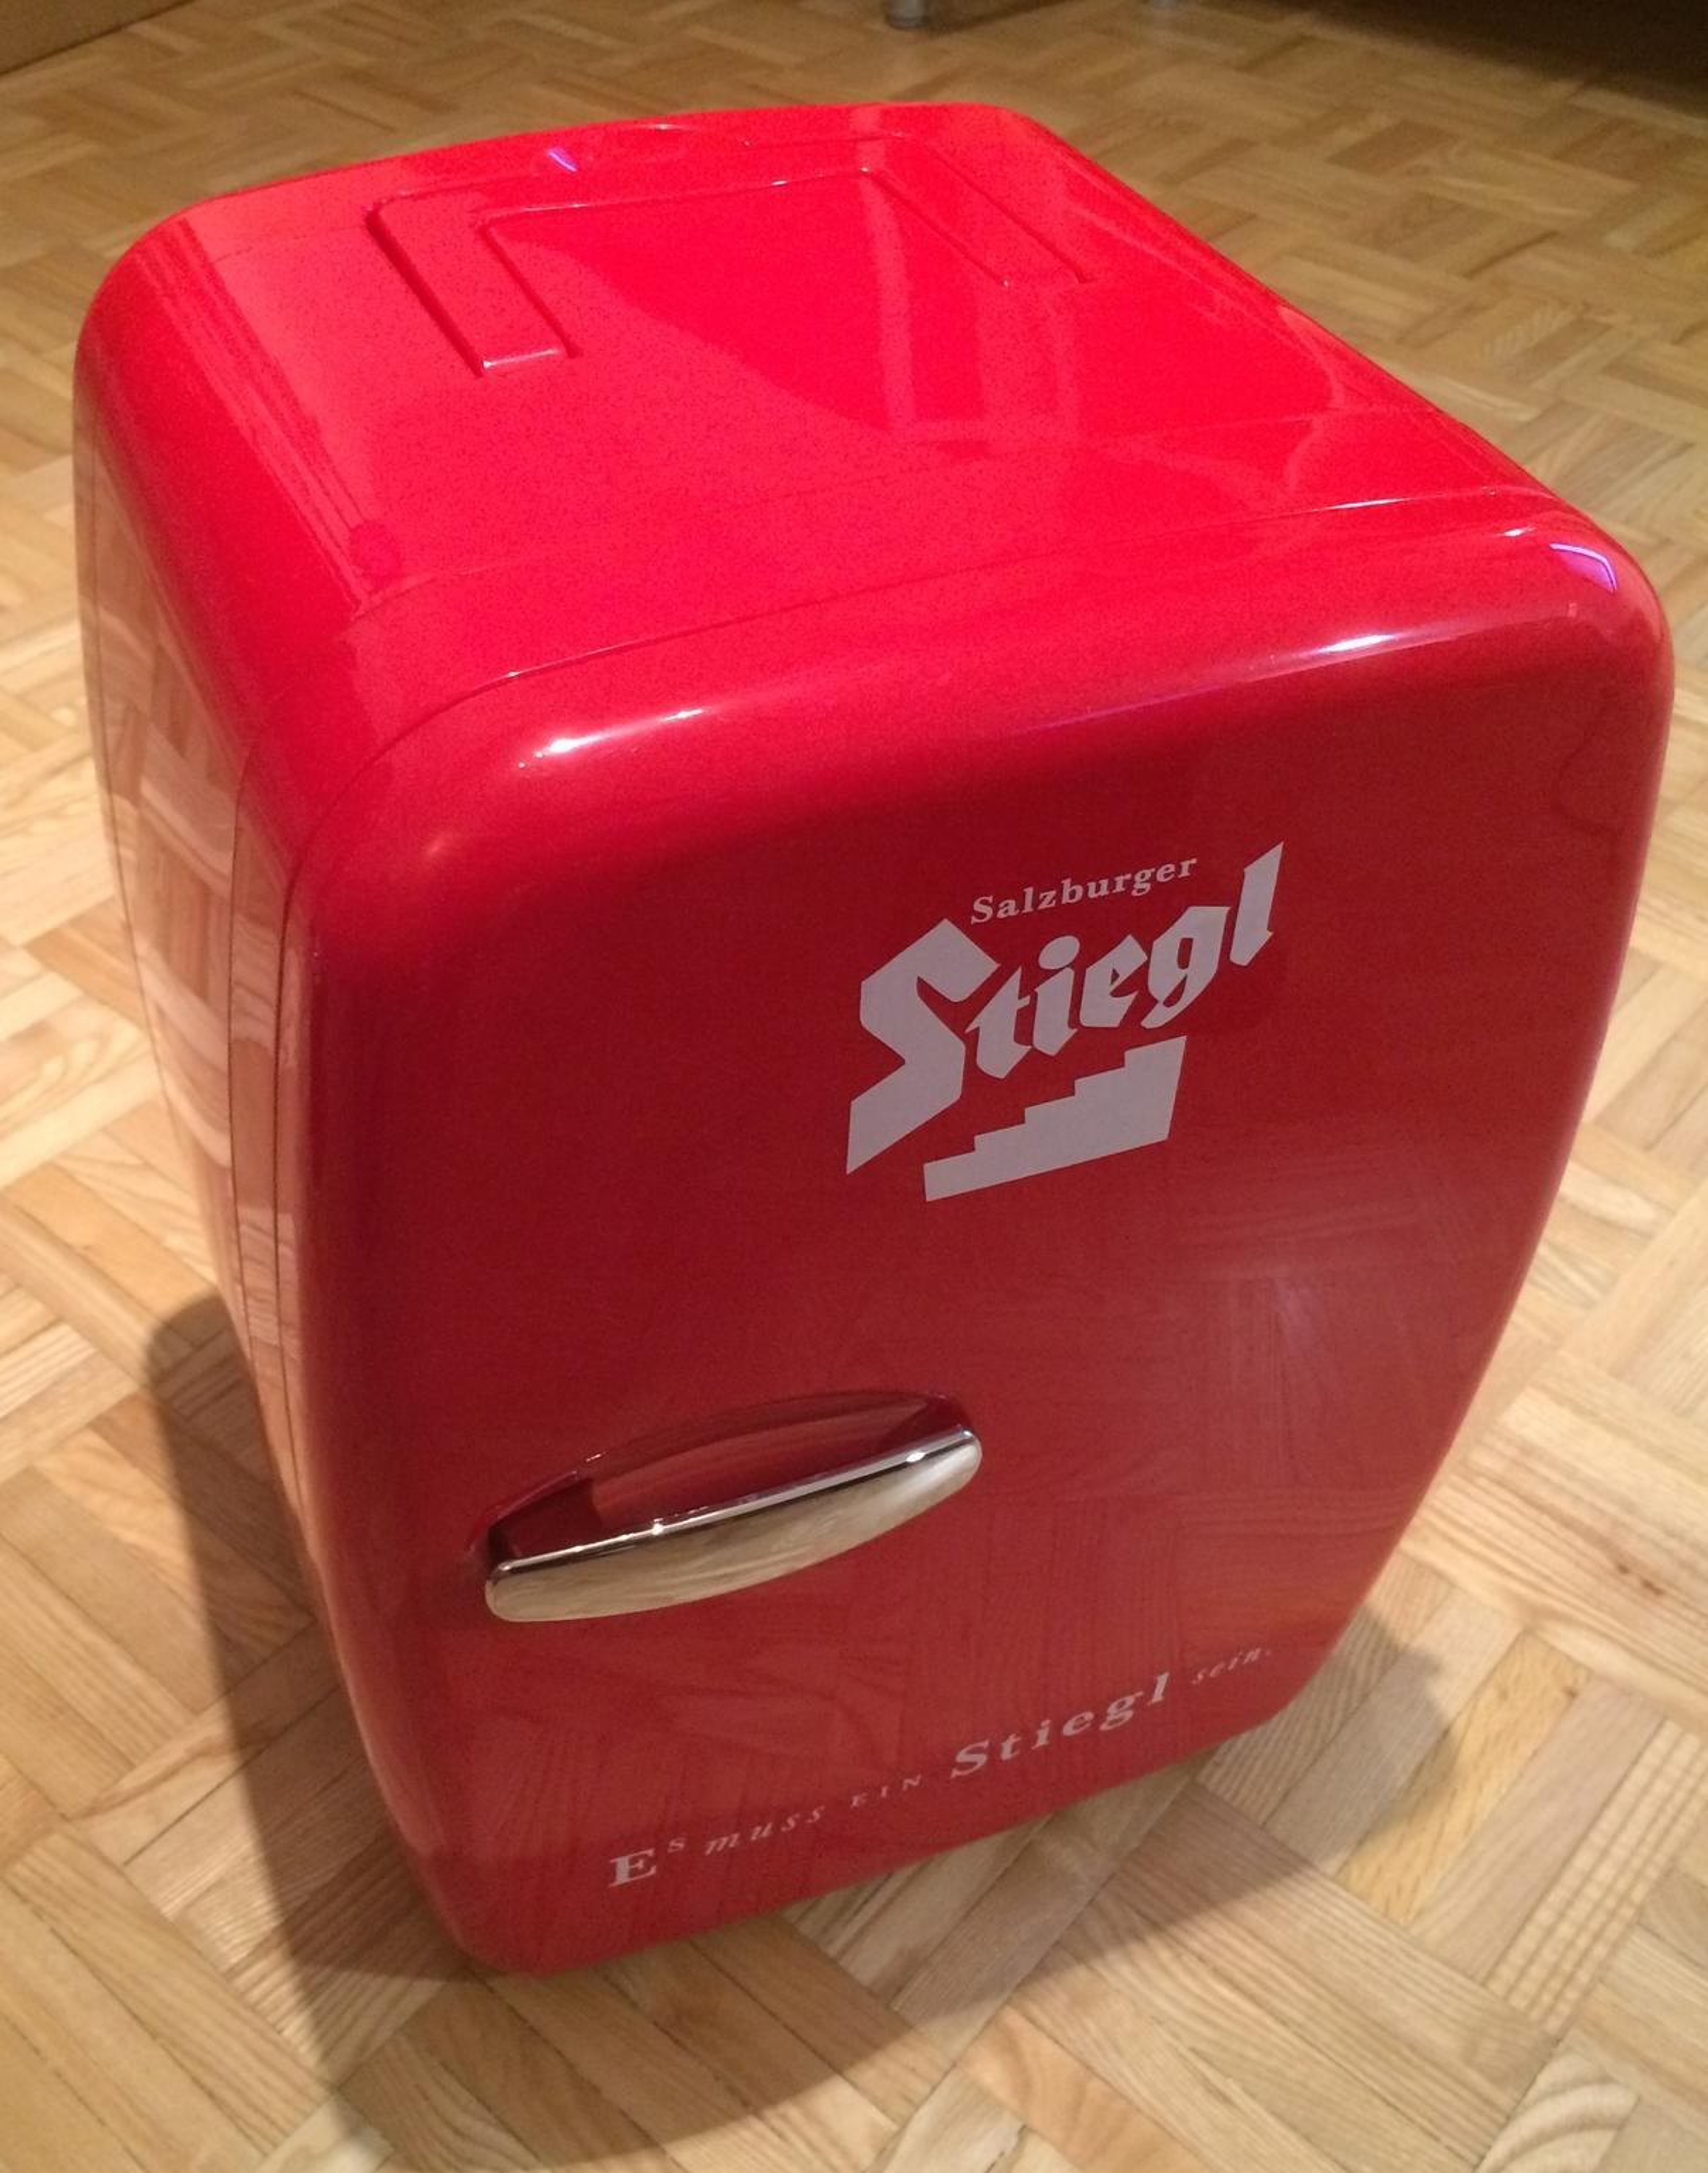 Stiegl Mini Kühlschrank : Stiegl mini kühlschrank scala stiegl hotel bolzano oyster review